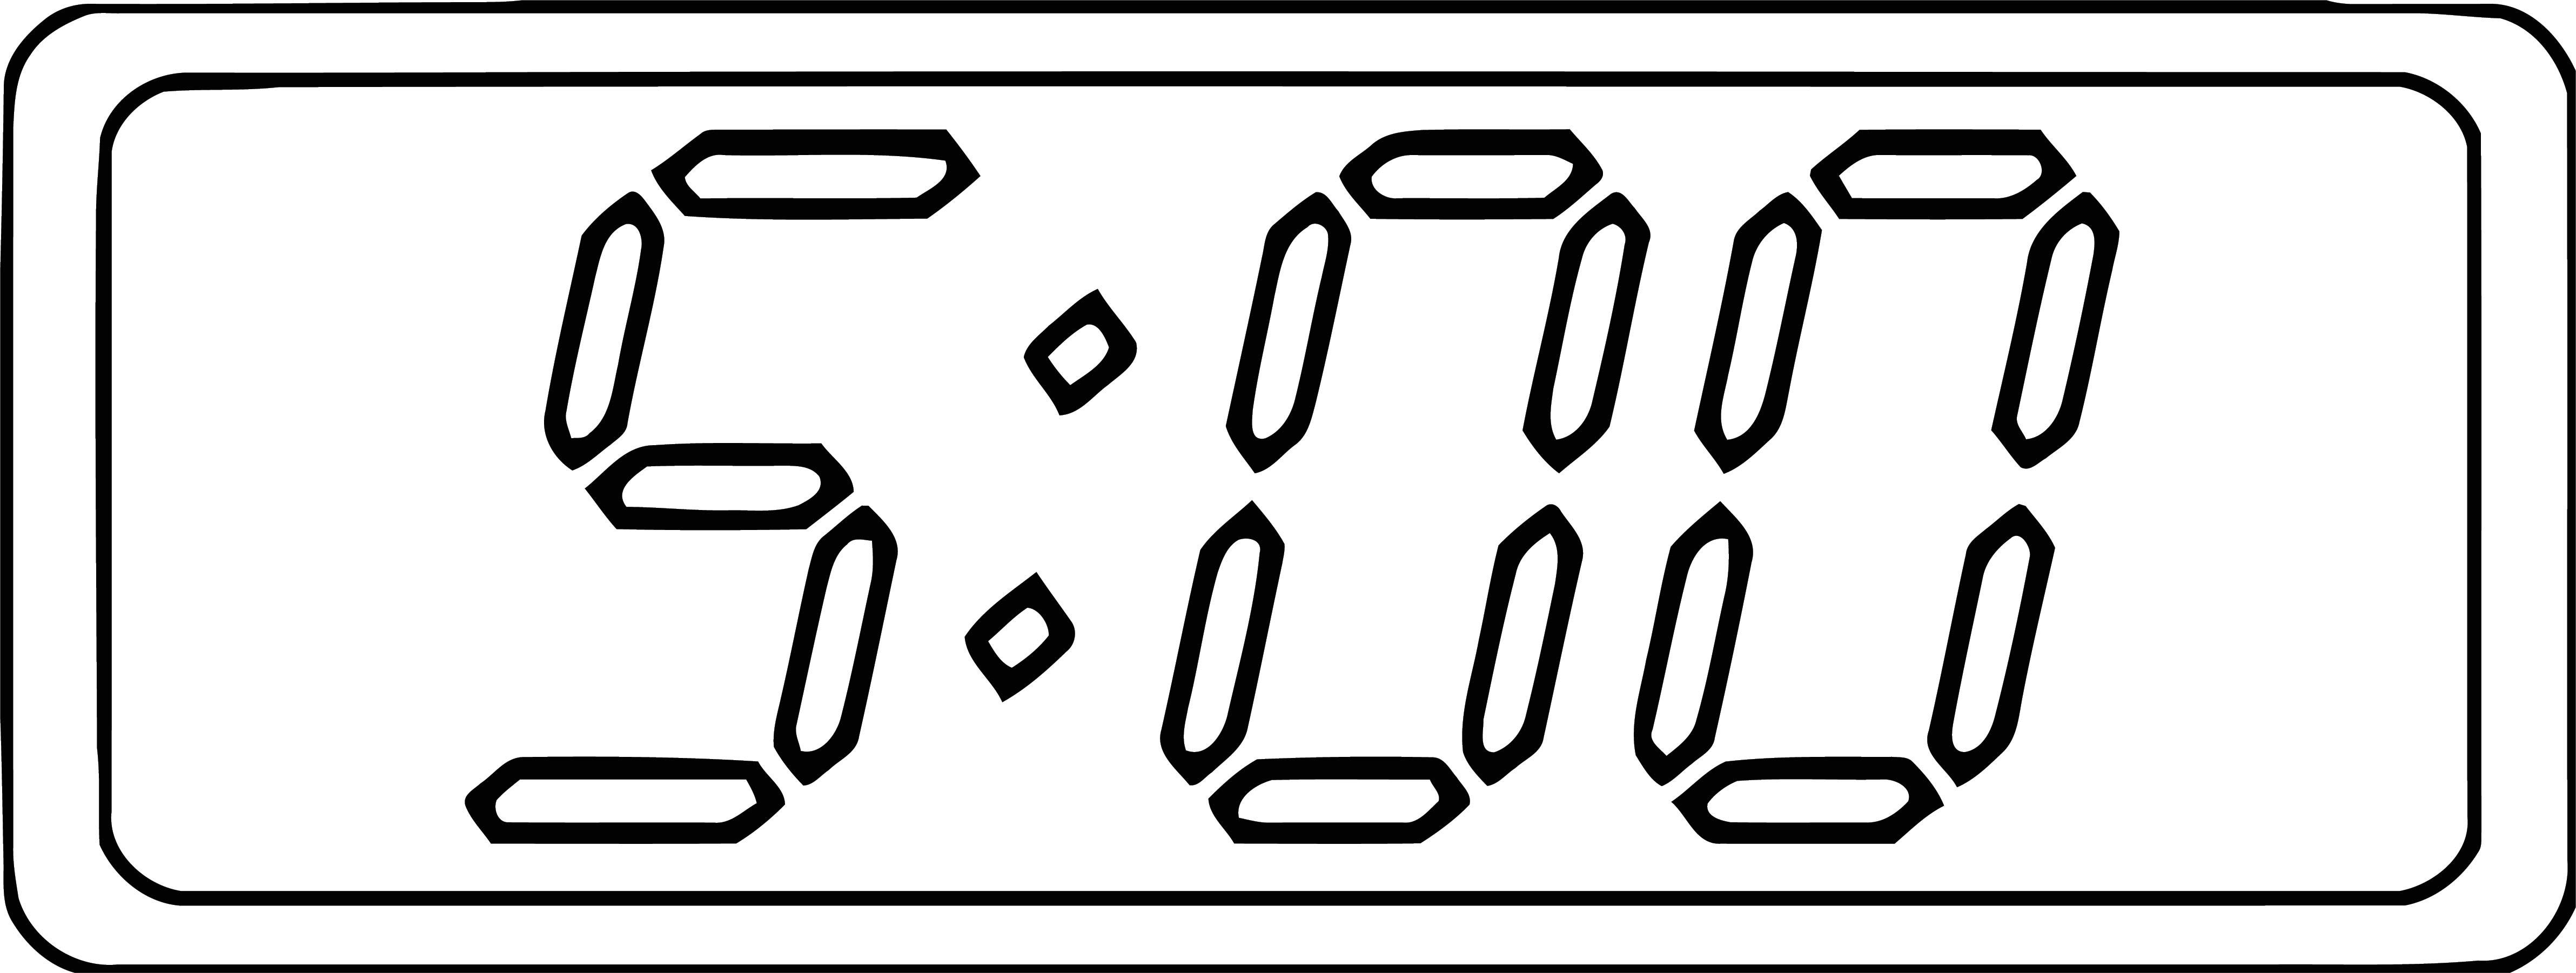 Digital Clock 500 Clip Art 103 Free Printable 29 Cartoonized Free Printable Coloring Page